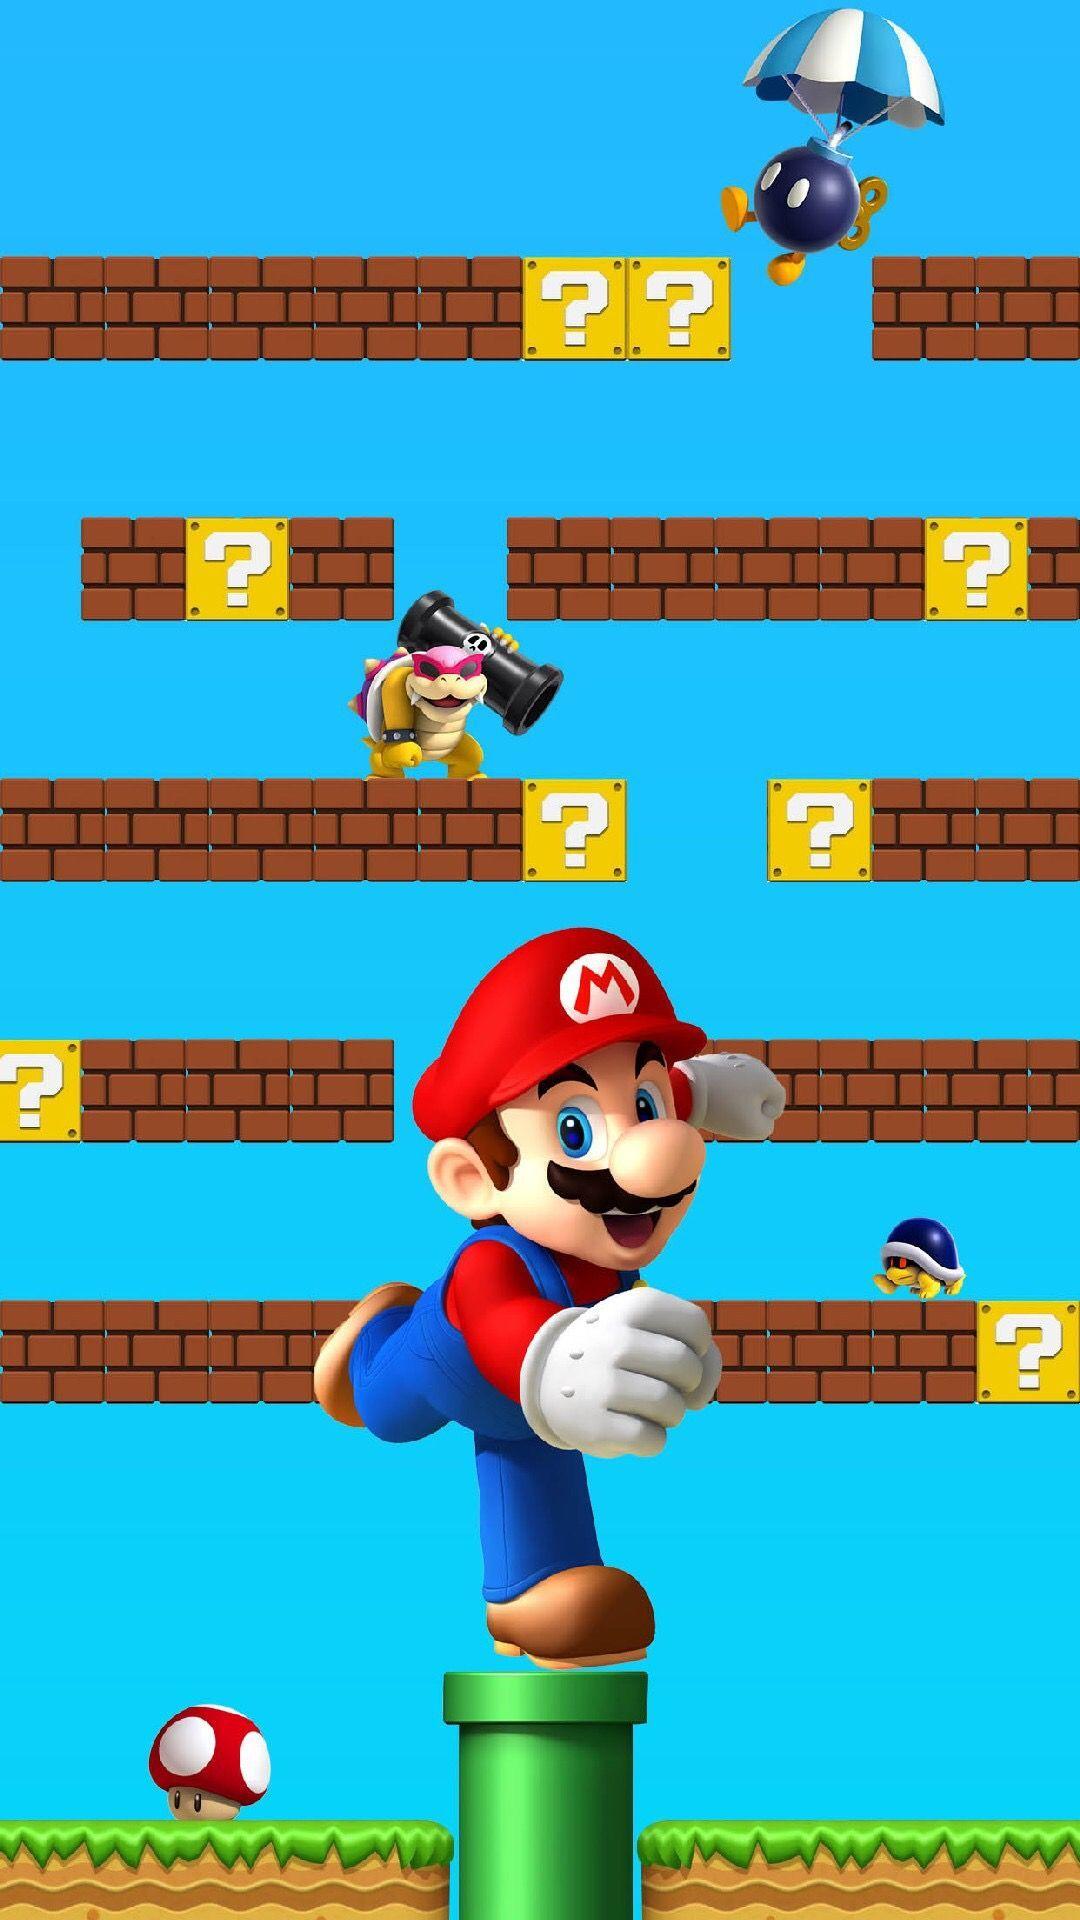 8 Bit Mario 8 Bit Mario Mario, 8 bit iphone wallpaper